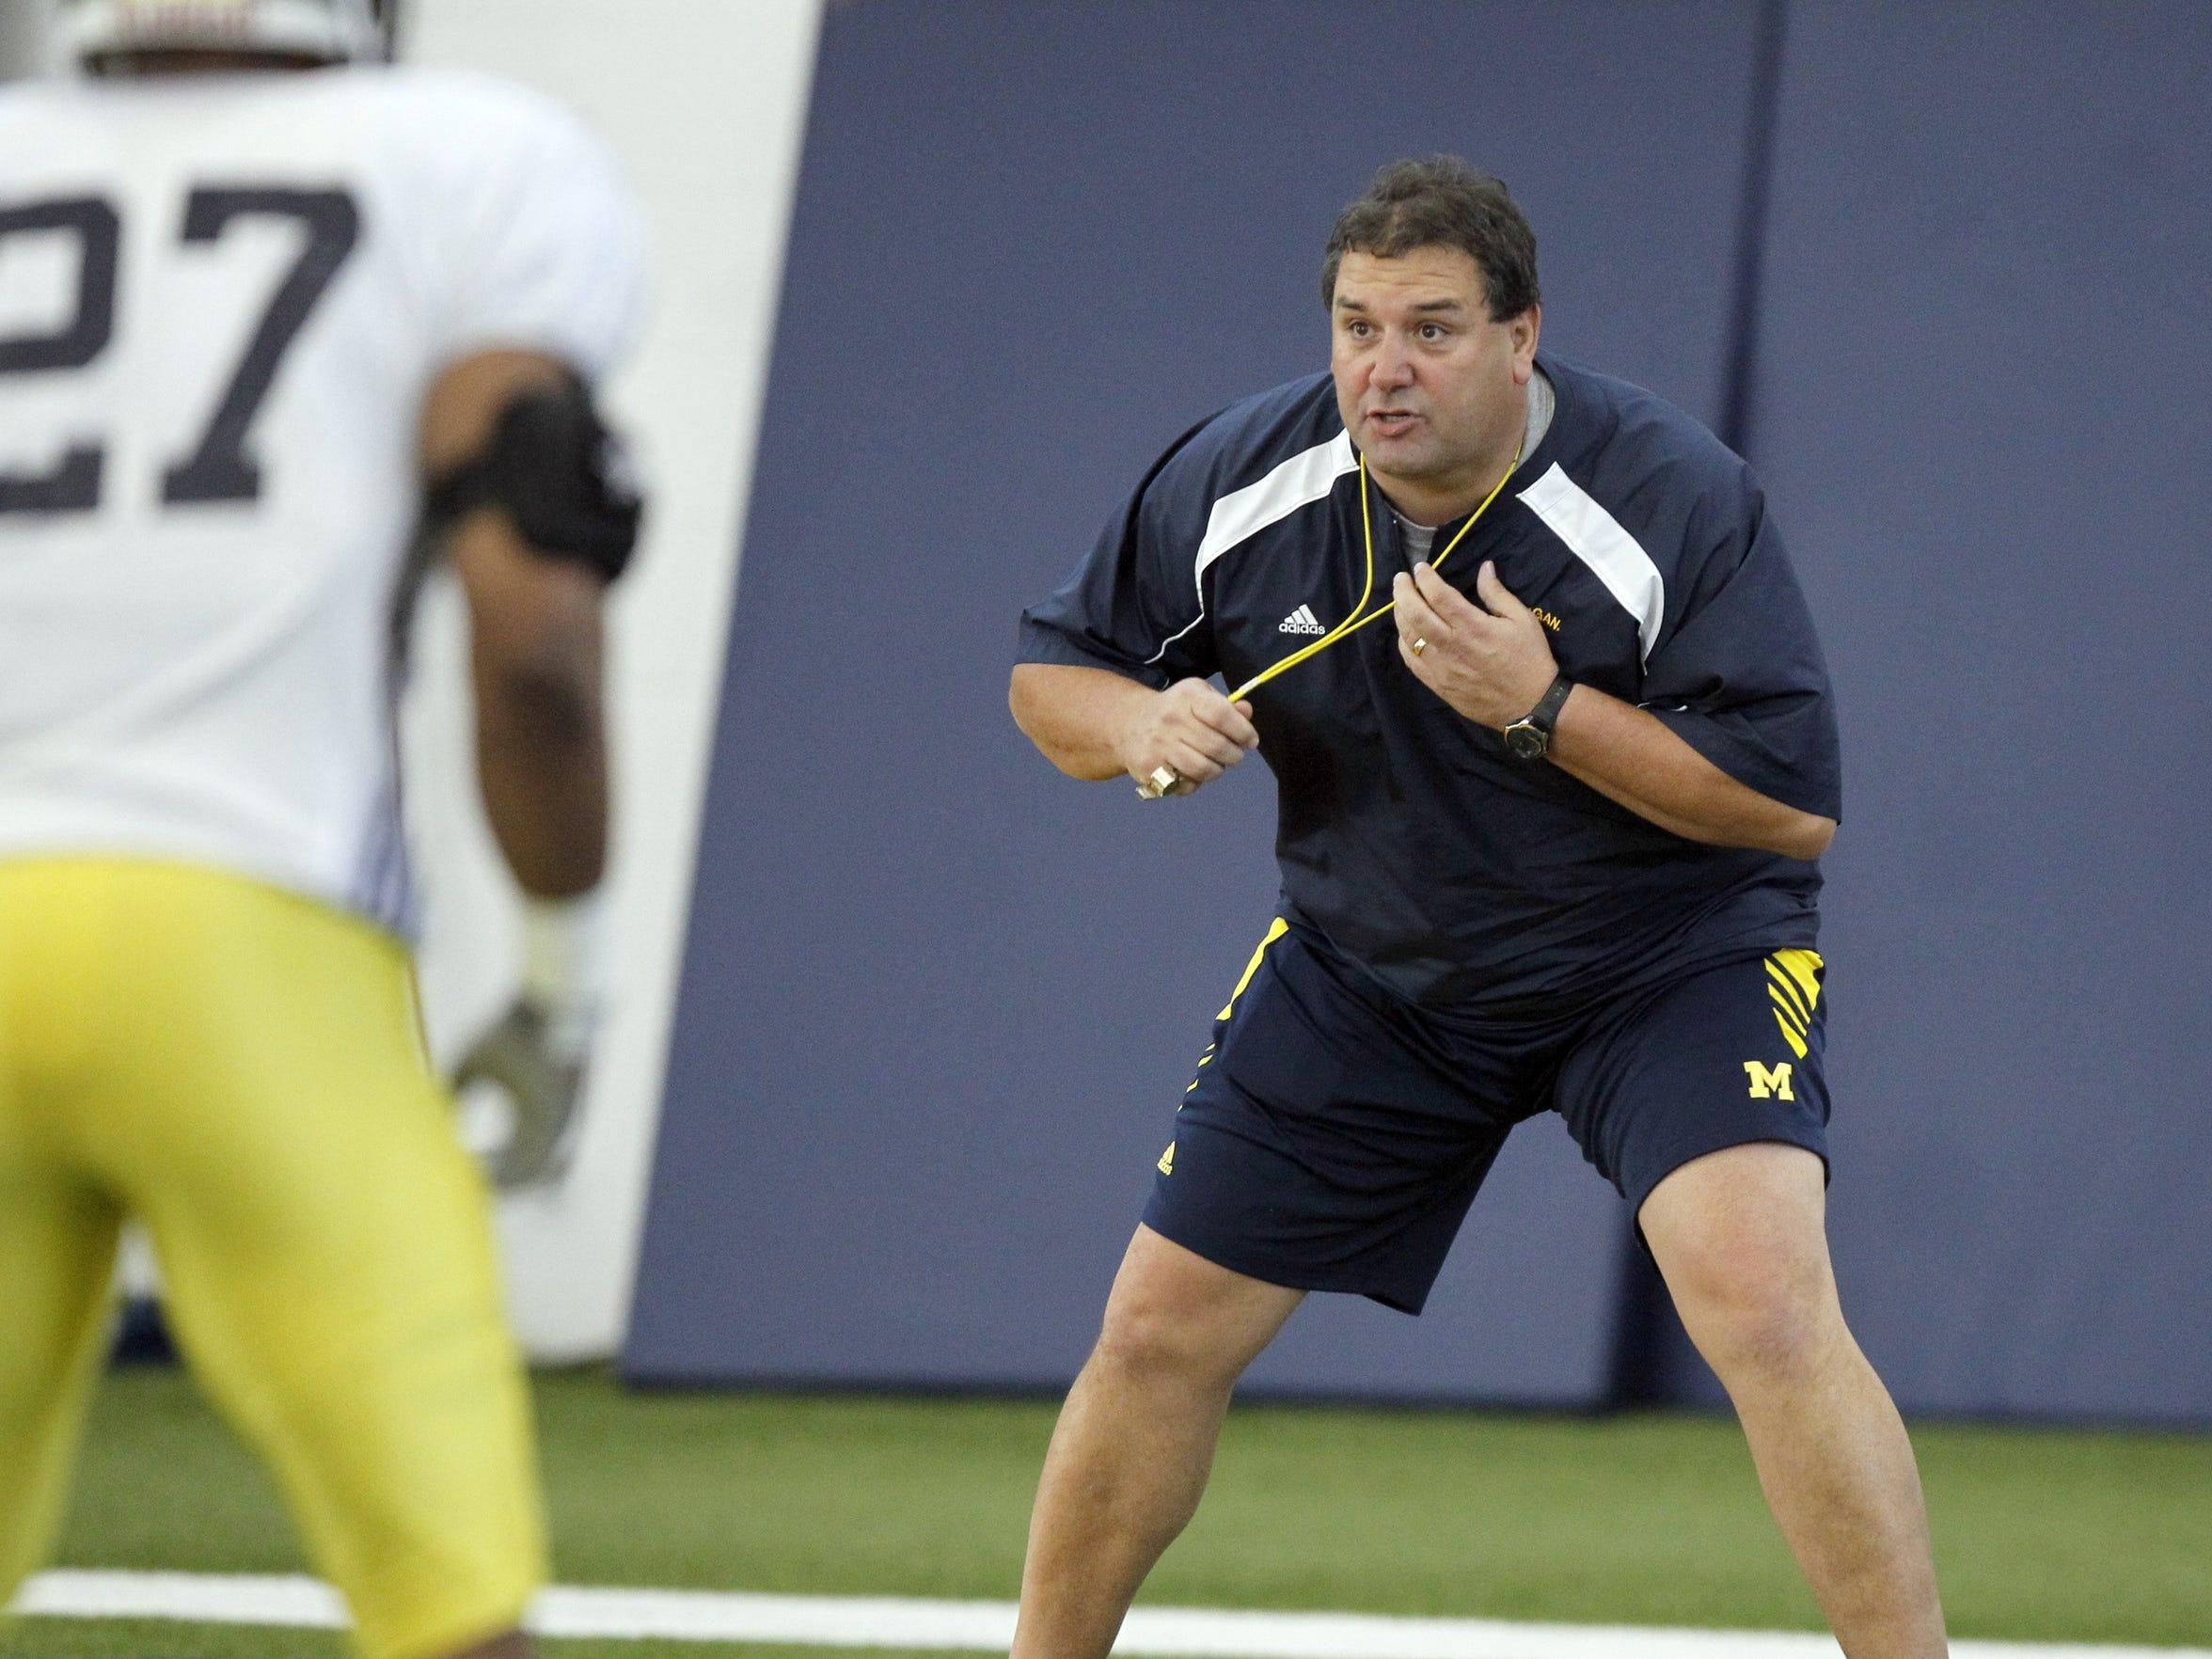 Michigan head coach Brady Hoke was all over the field